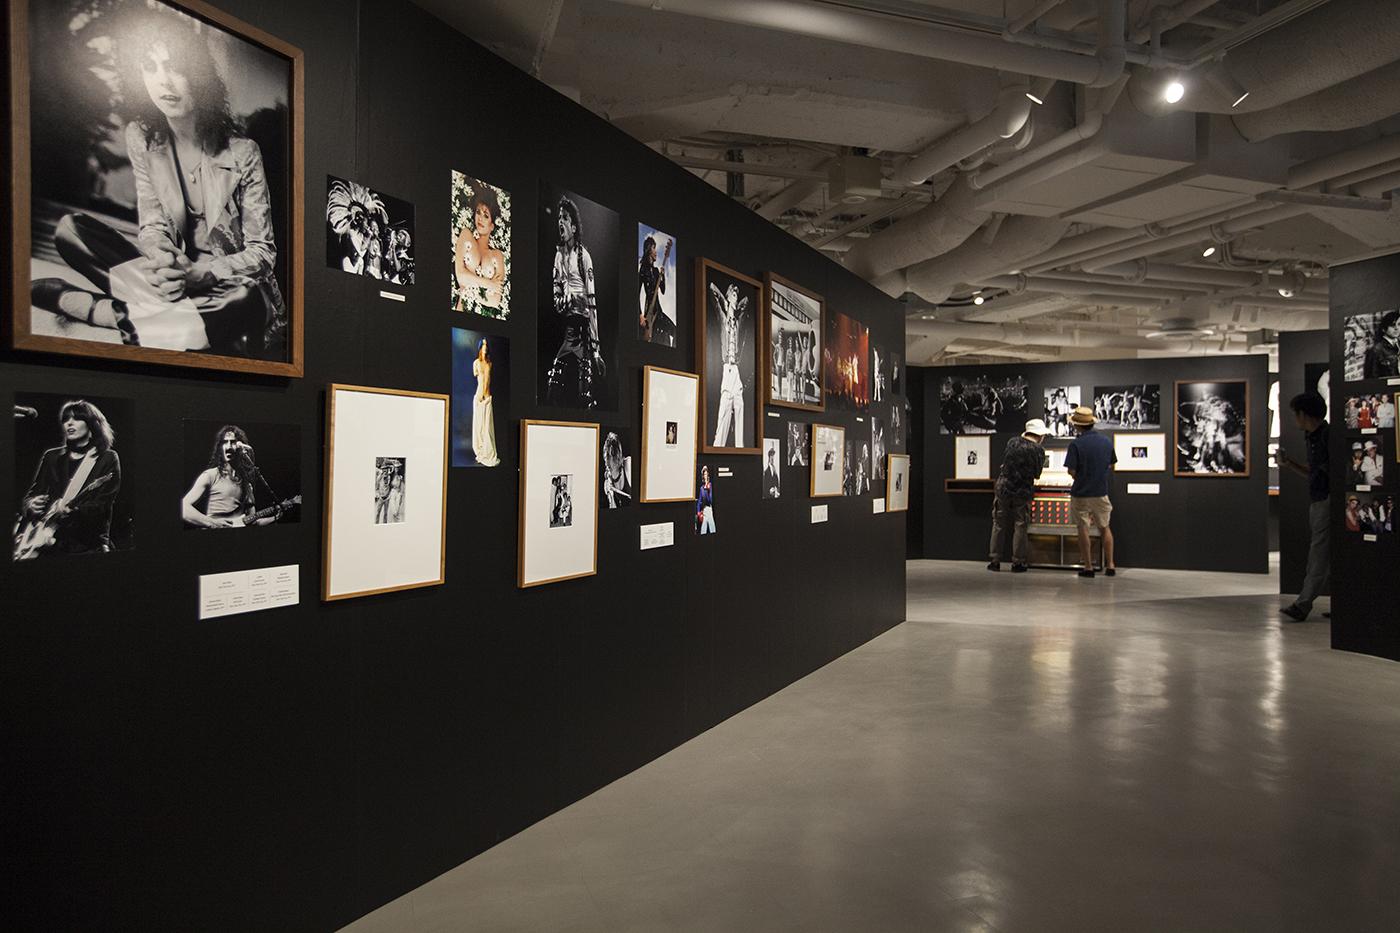 m-0014 【レポート】ロックの歴史が凝縮。フジロックファンも必見のボブ・グルーエン写真展